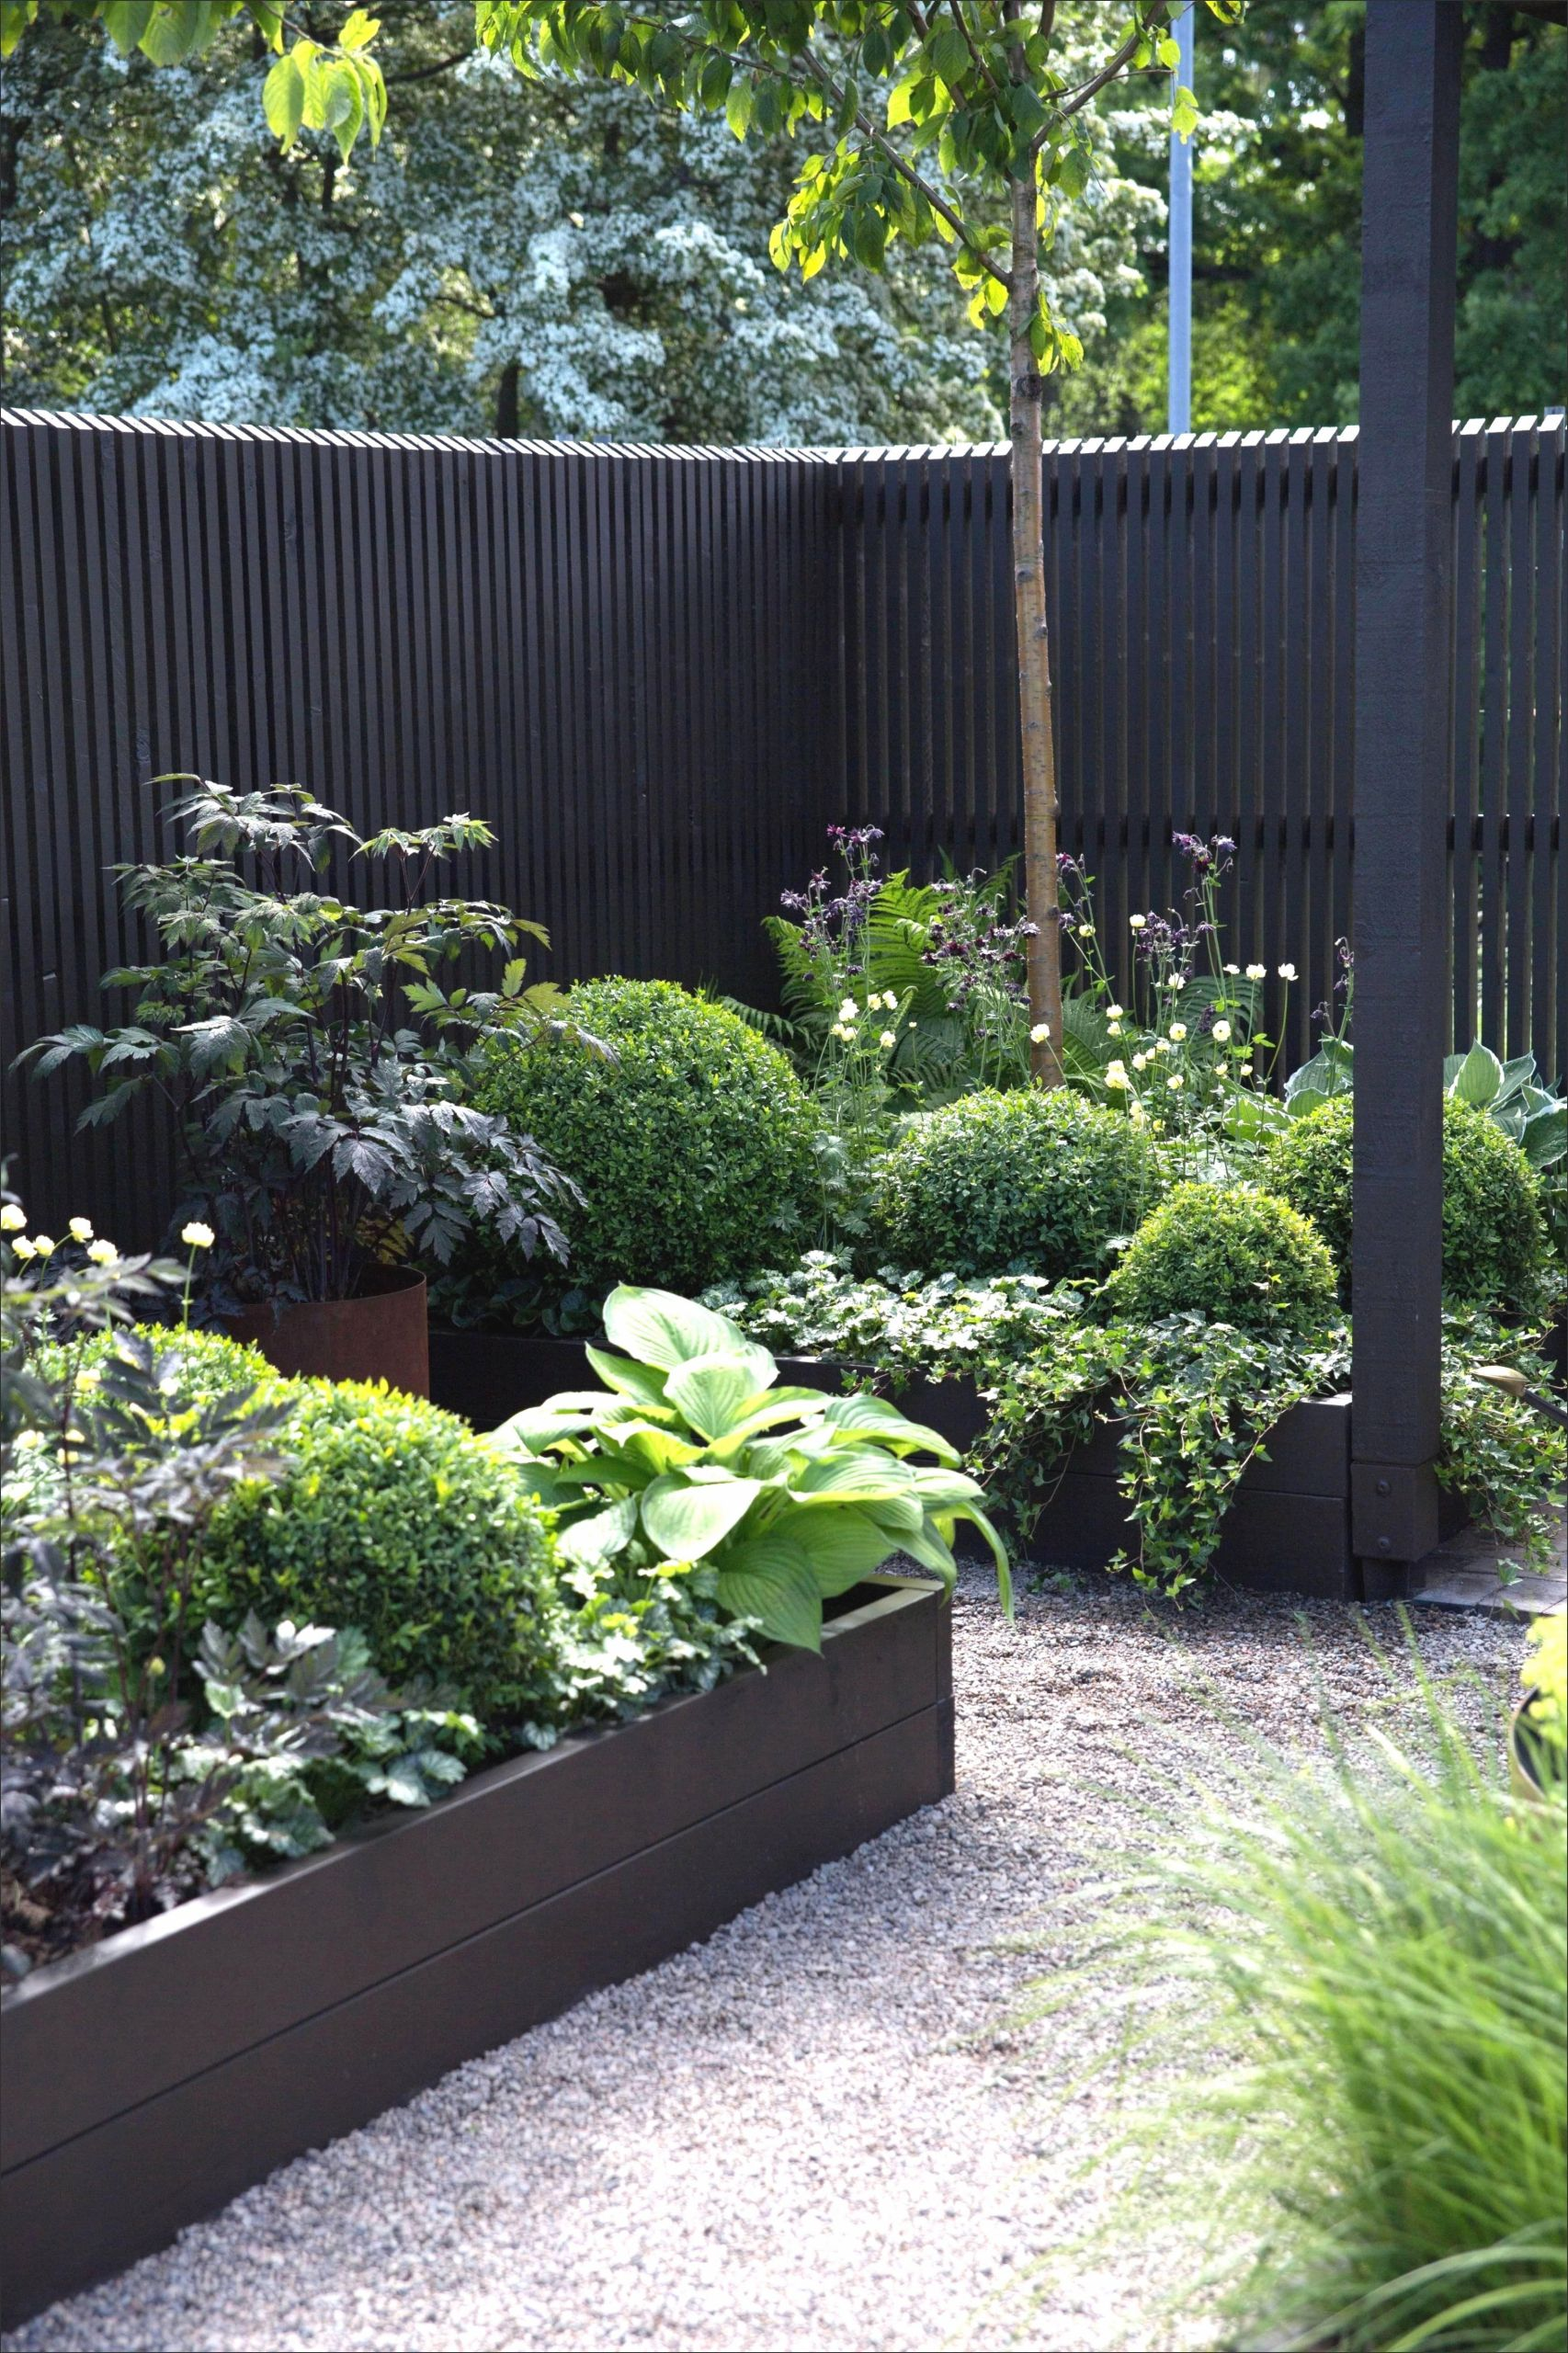 Beetgestaltung Ideen Neu Gartengestaltung Ideen Mit Steinen — Temobardz Home Blog